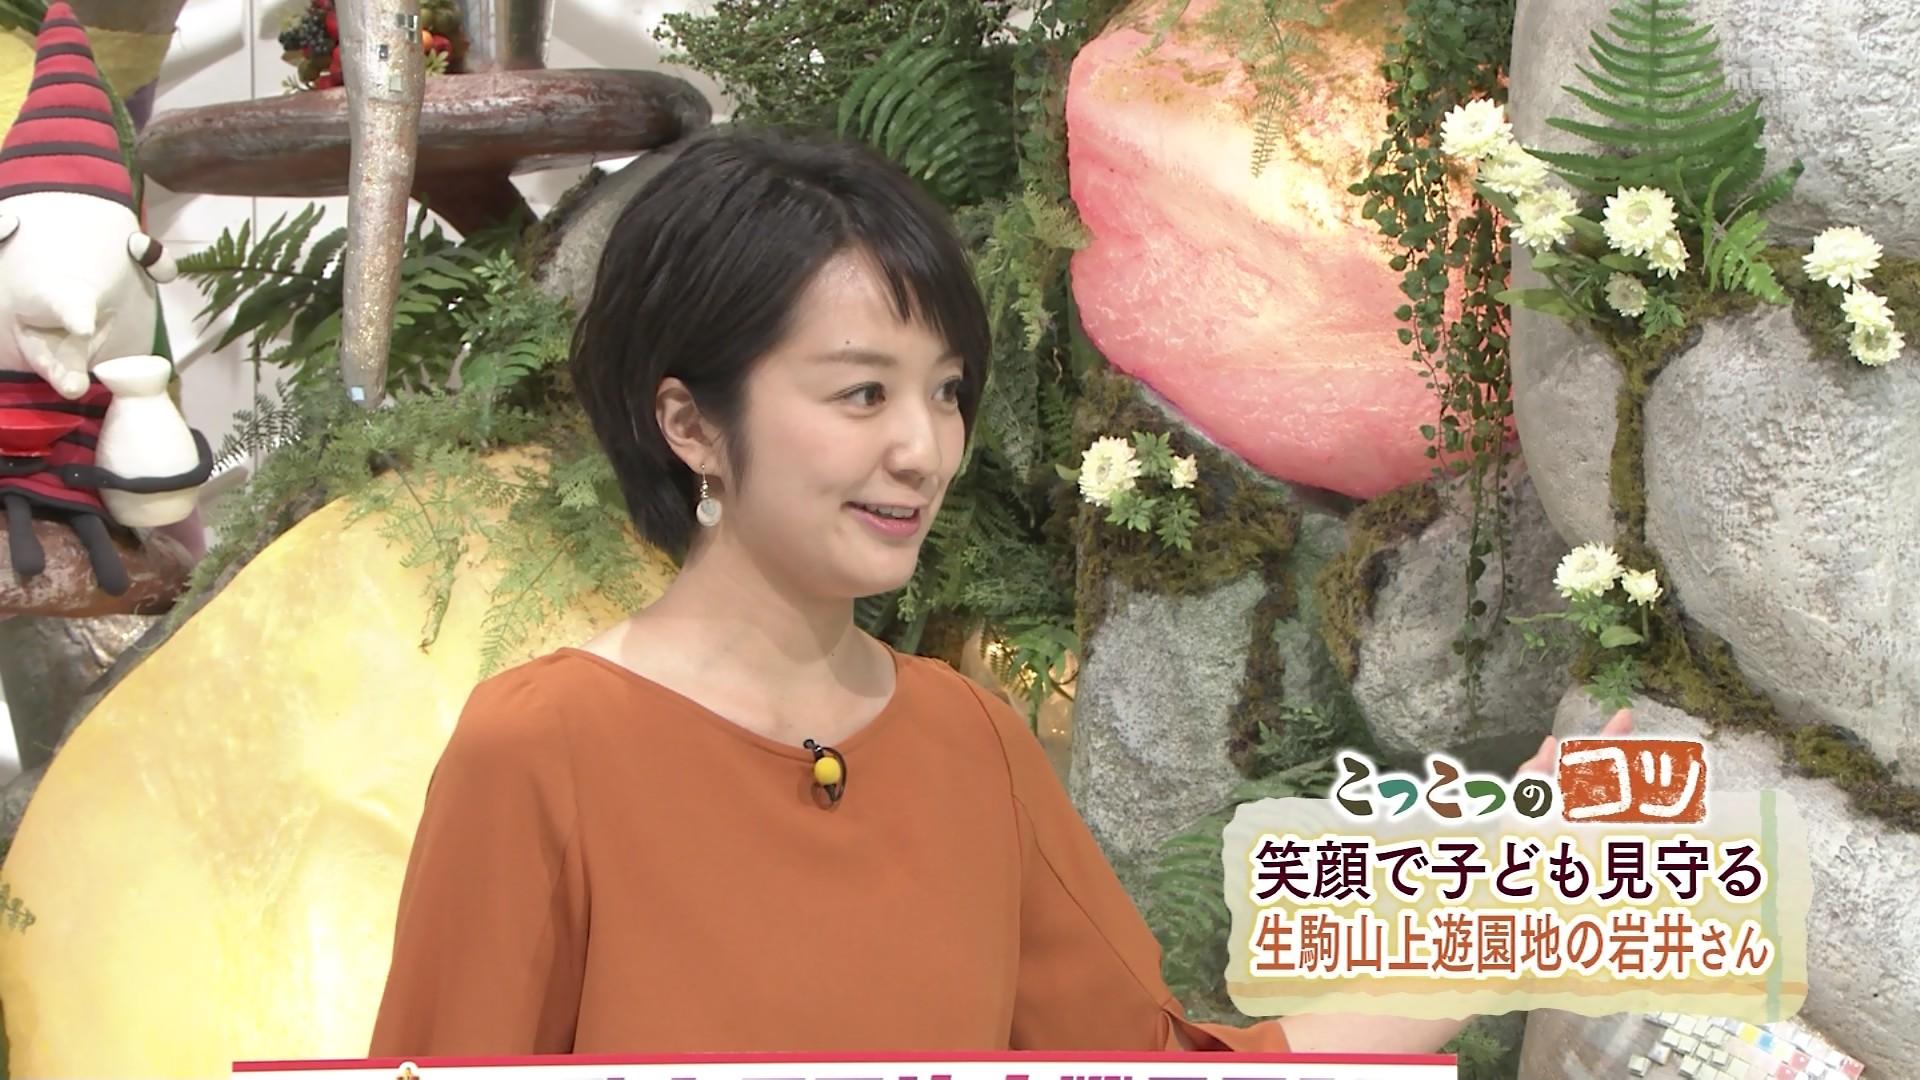 MBS藤林温子さんのテレビキャプチャー画像-017